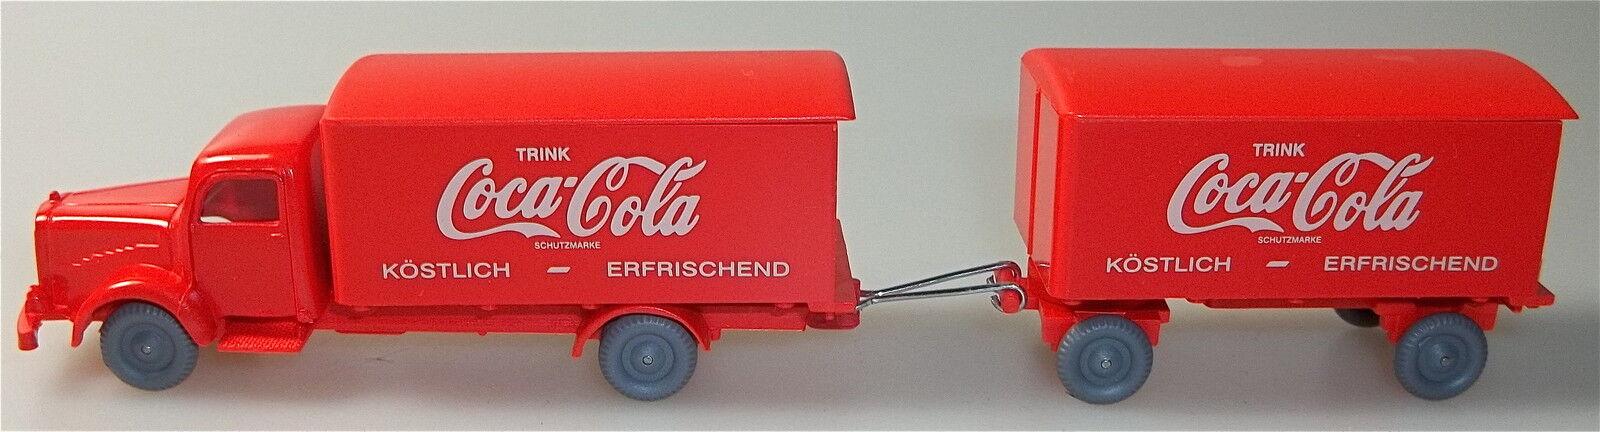 Coca Cola Red Red Mercedes 5000 Hängerzug IMU h0 1 87 å